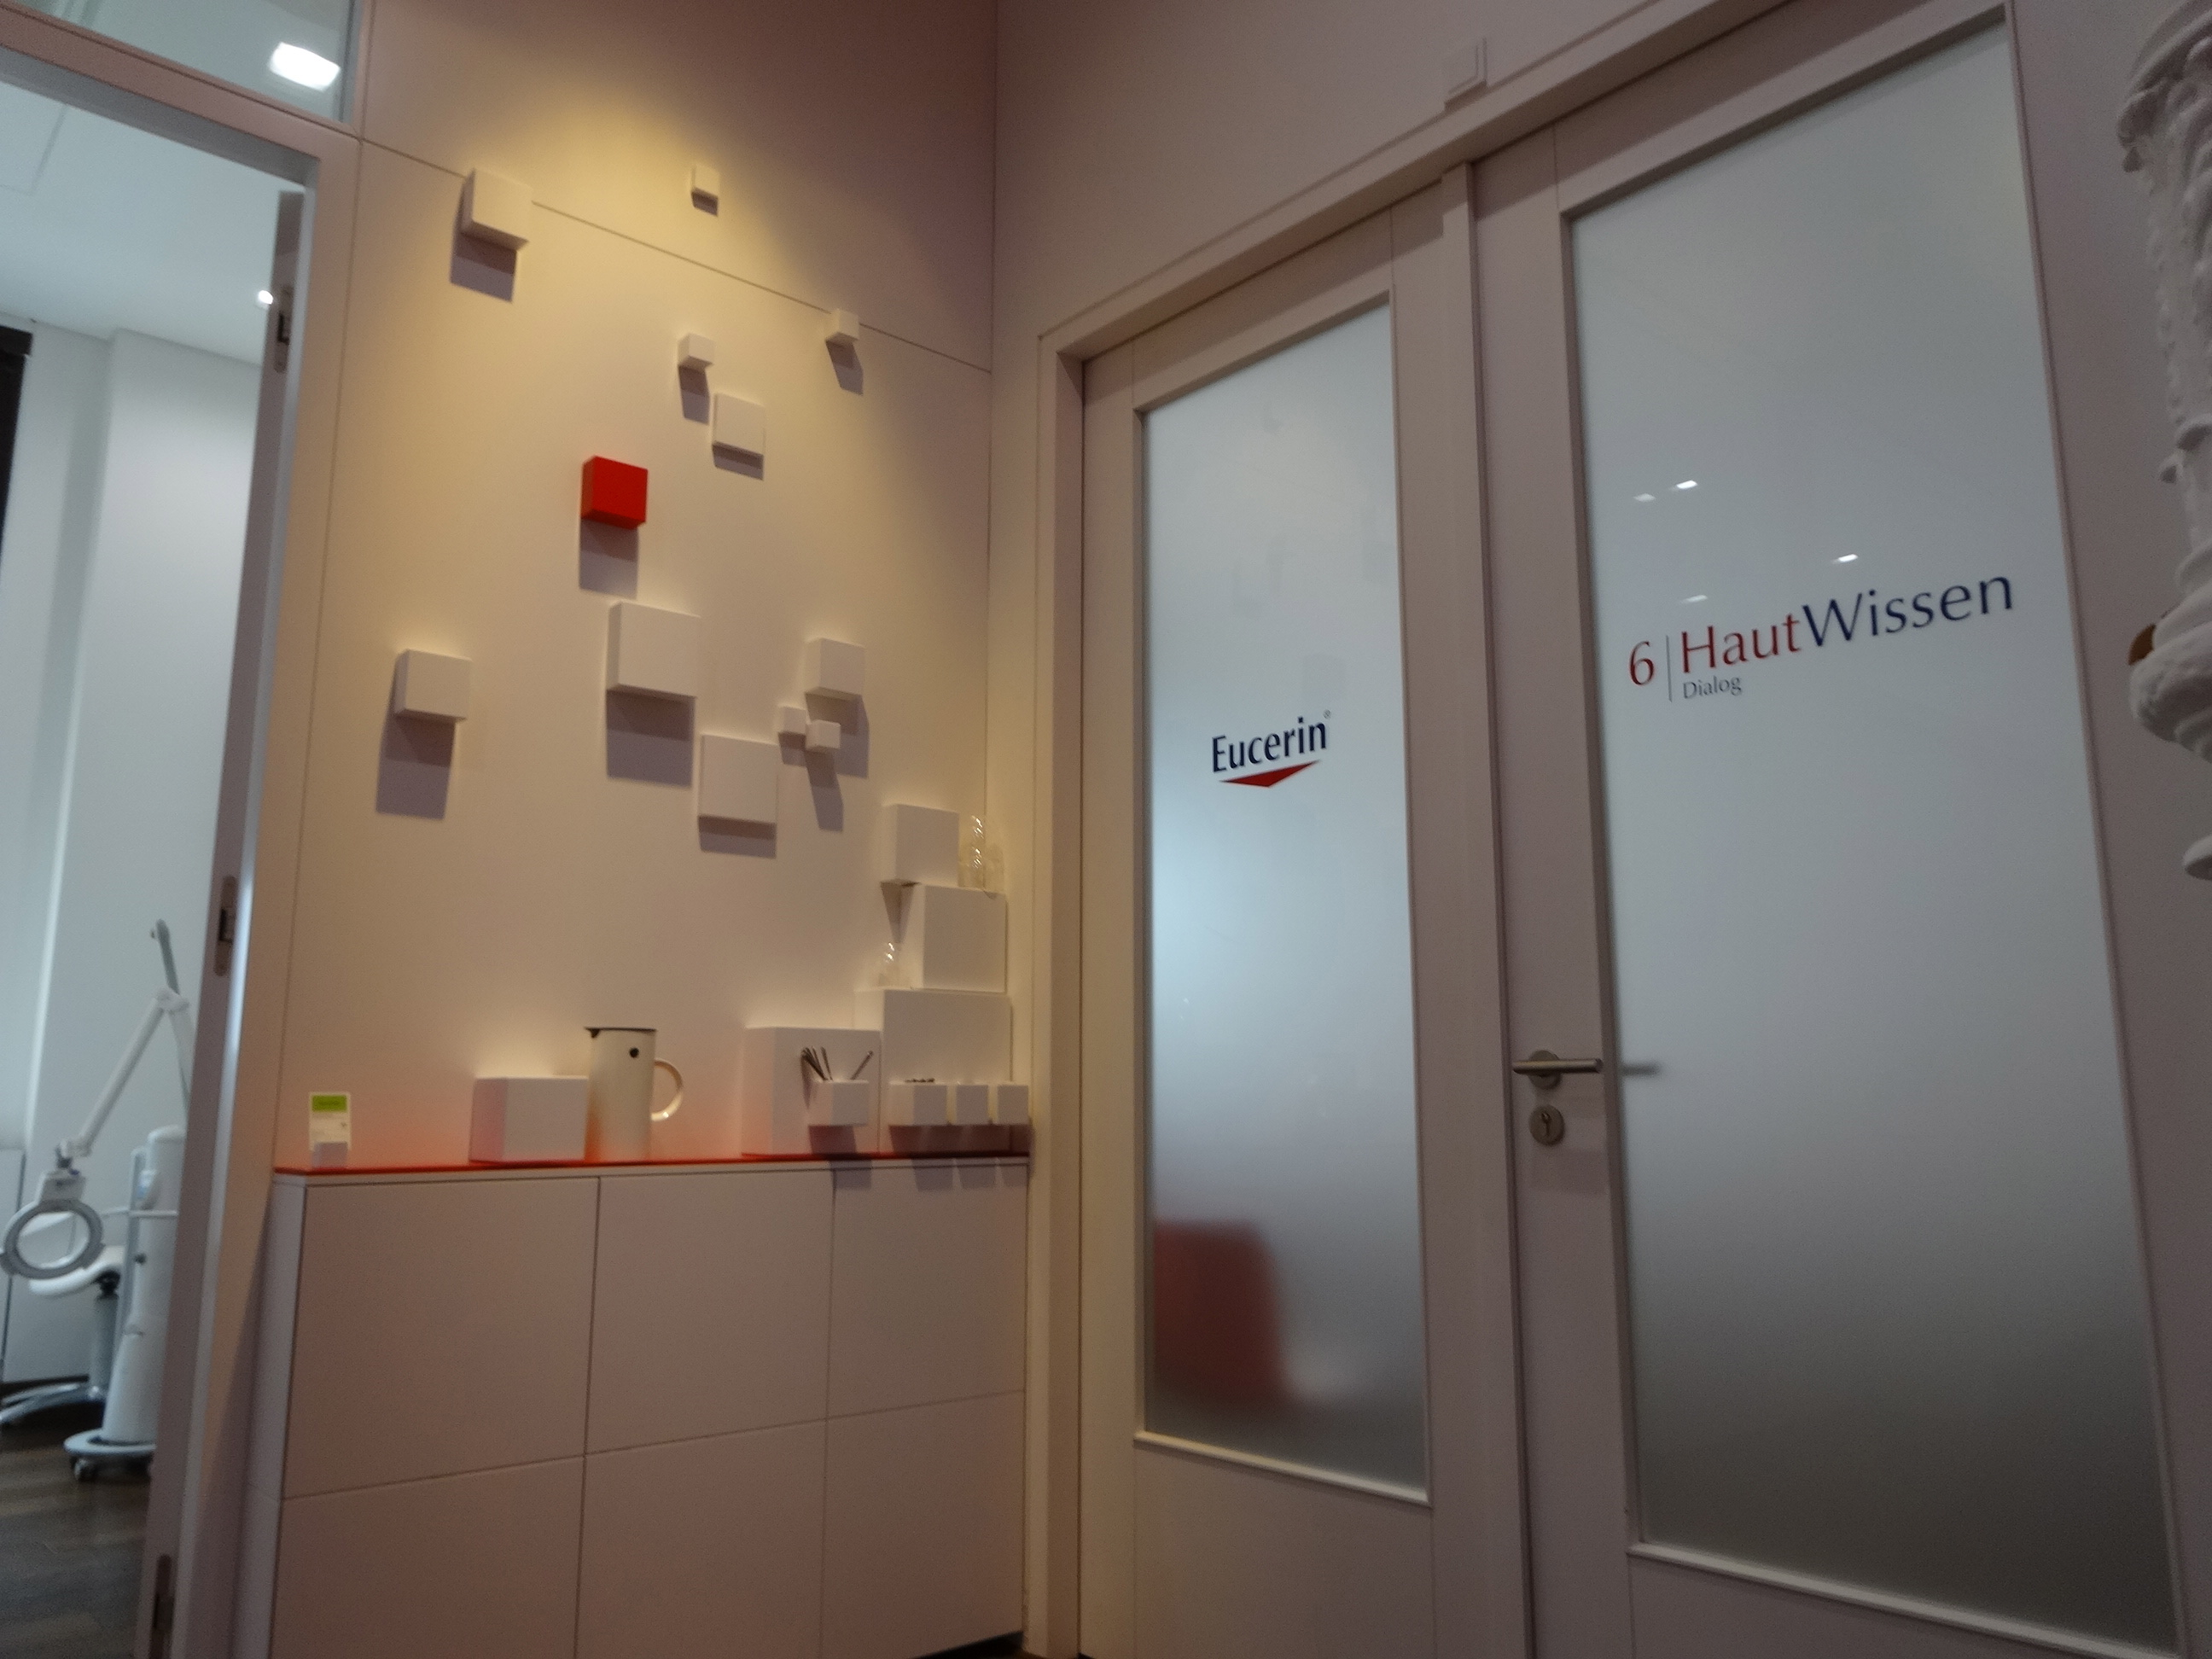 Eucerin Haut Institut Hamburg 7 HappyFace313